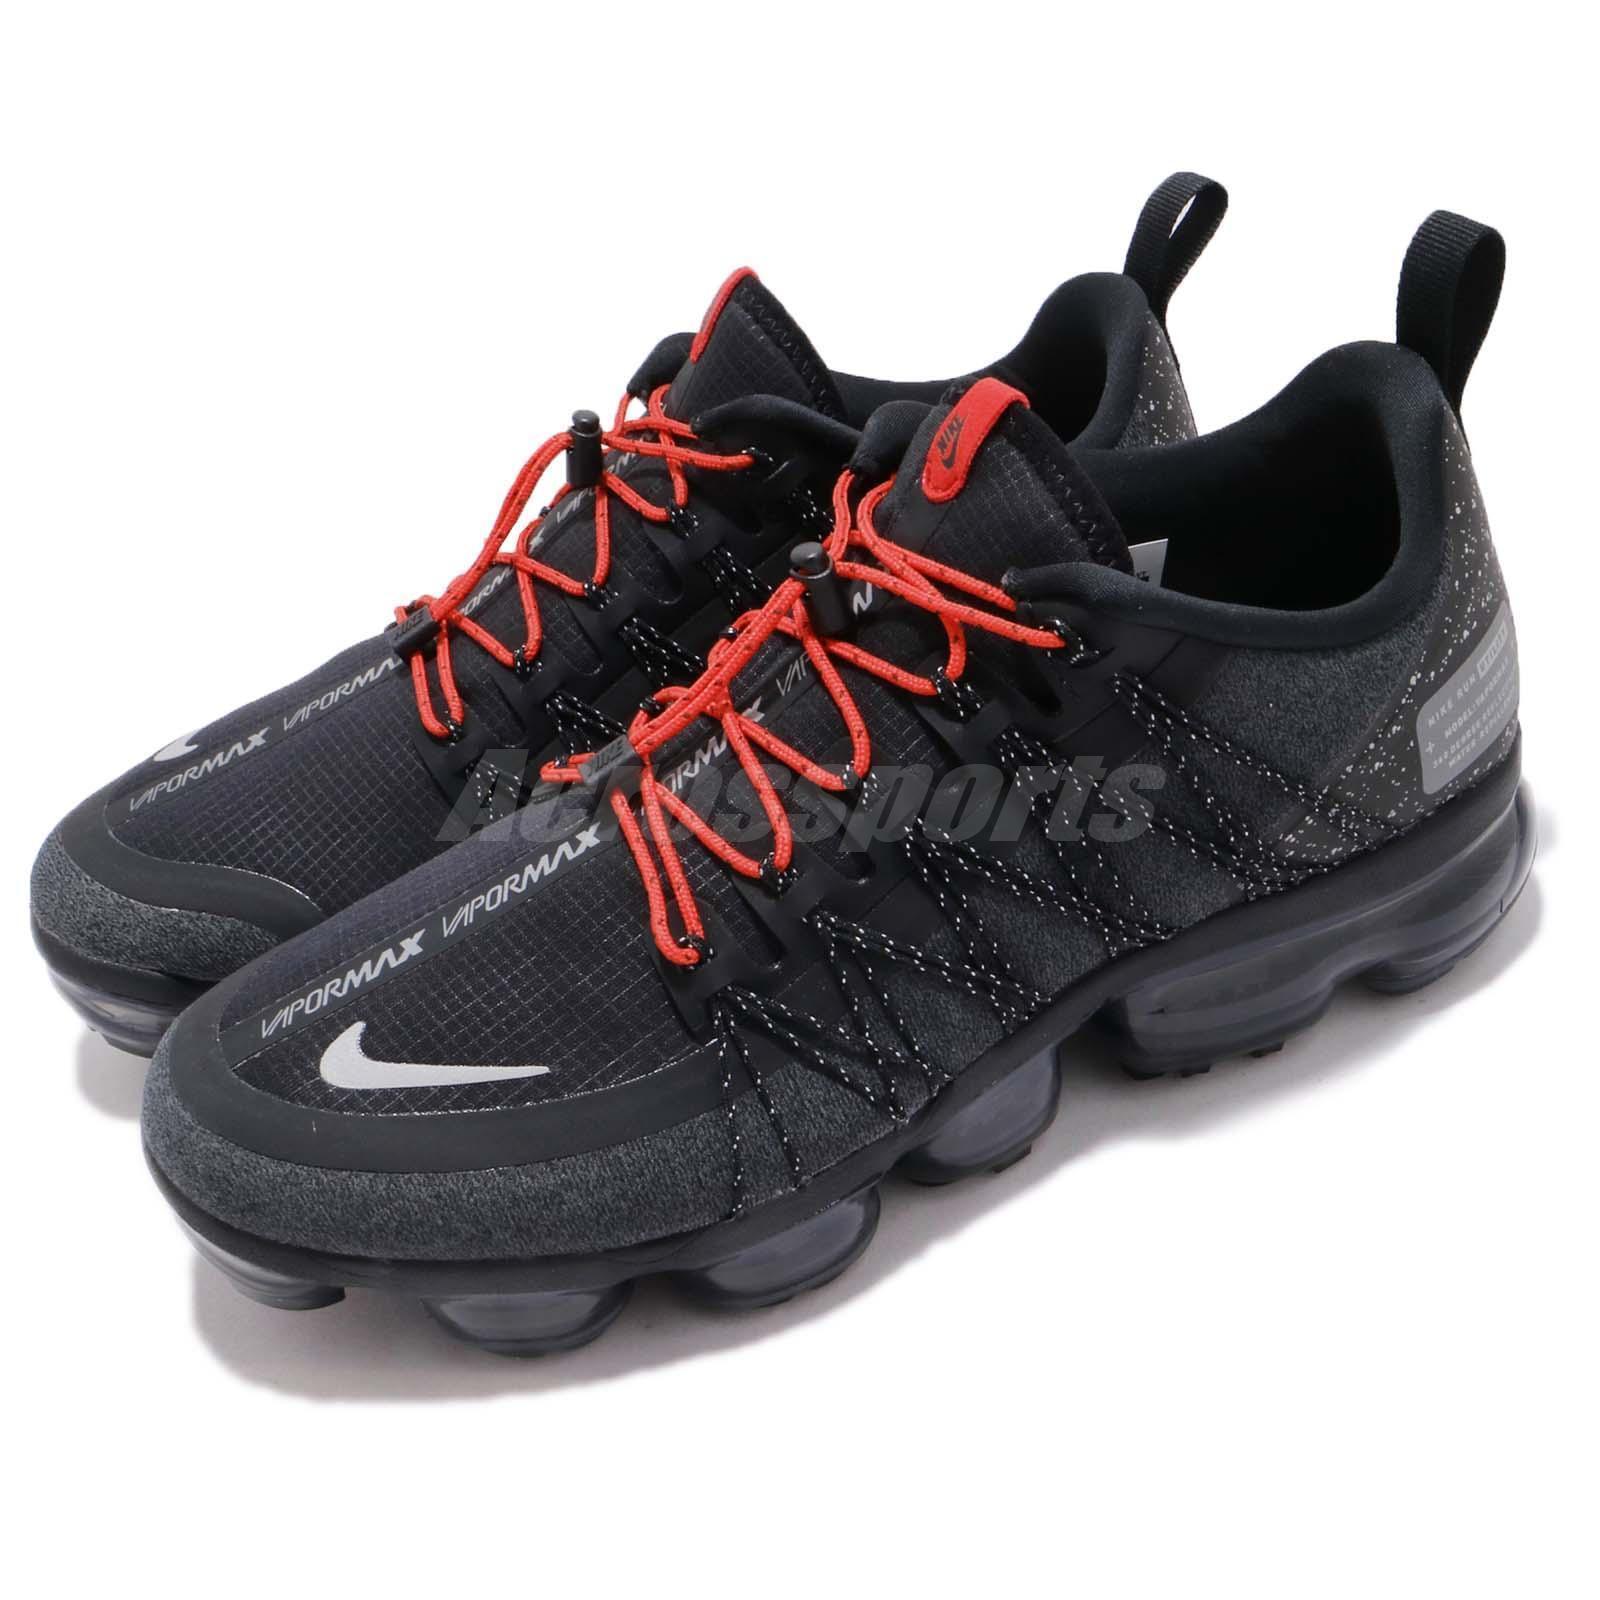 7102633d77 Nike Air Vapormax Run Utility Mens Aq8810-001 Black Red Running ...